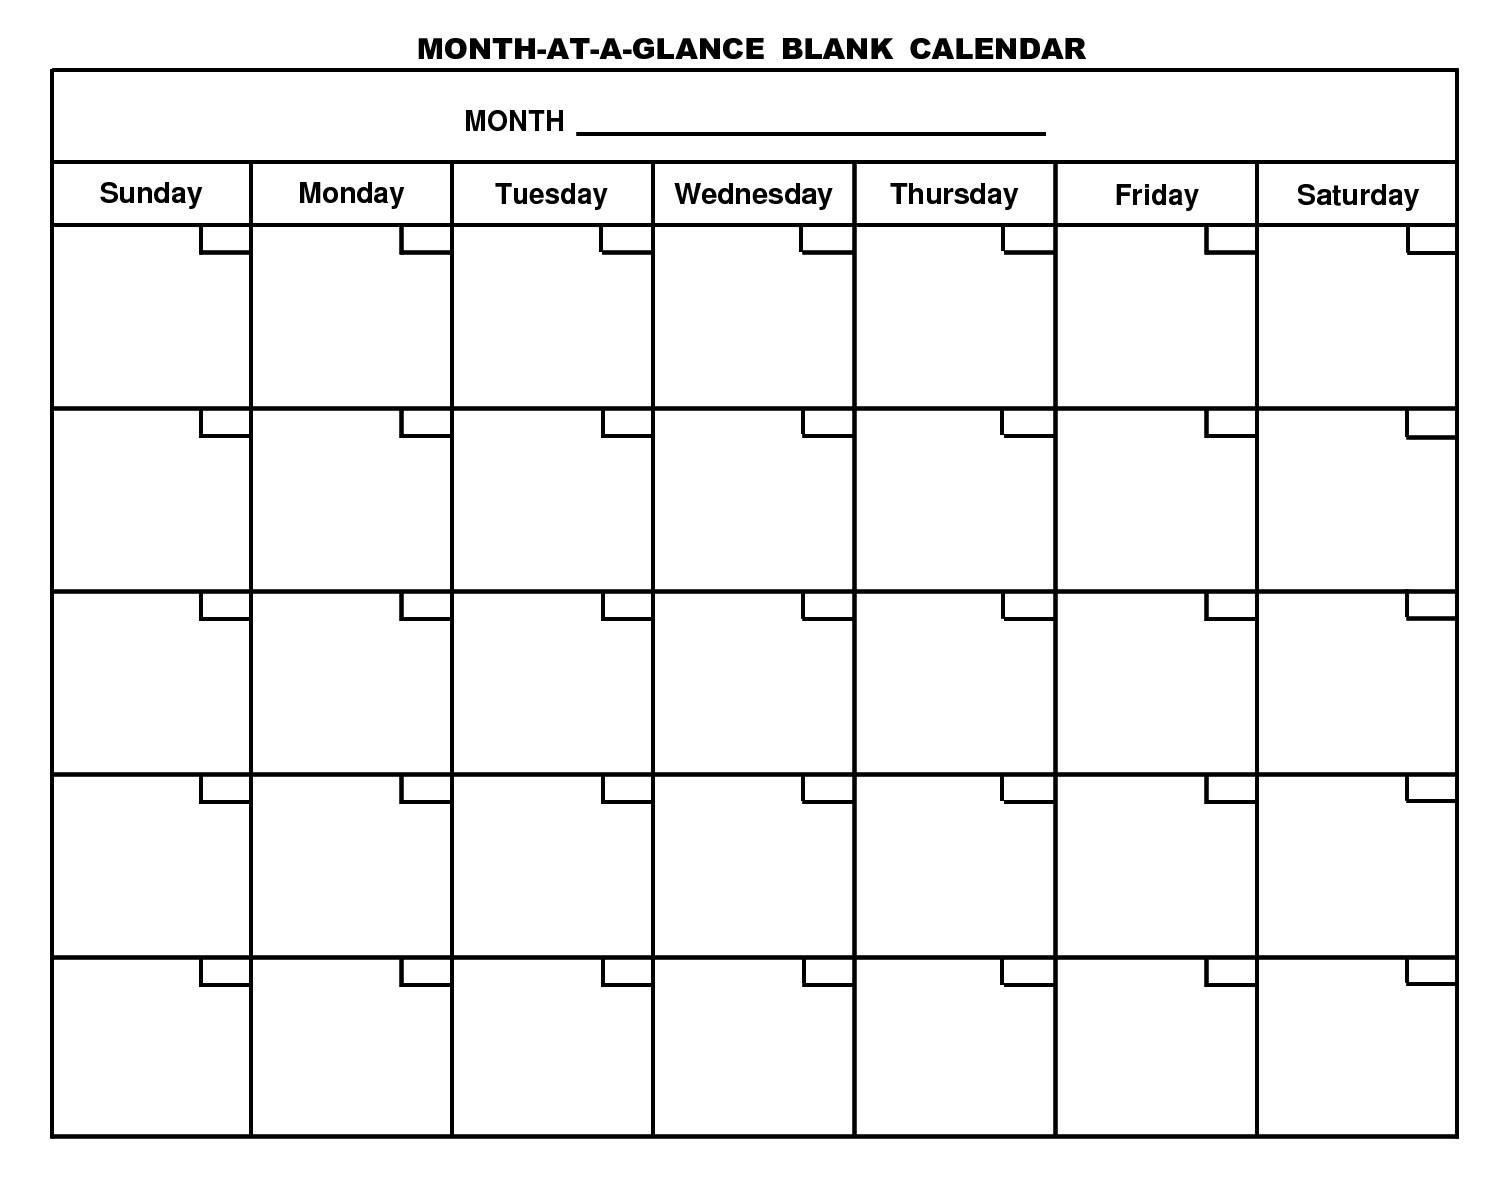 Calendar Template To Print Calendar Month Printable Inside Calendar pertaining to Month At A Glance Printable